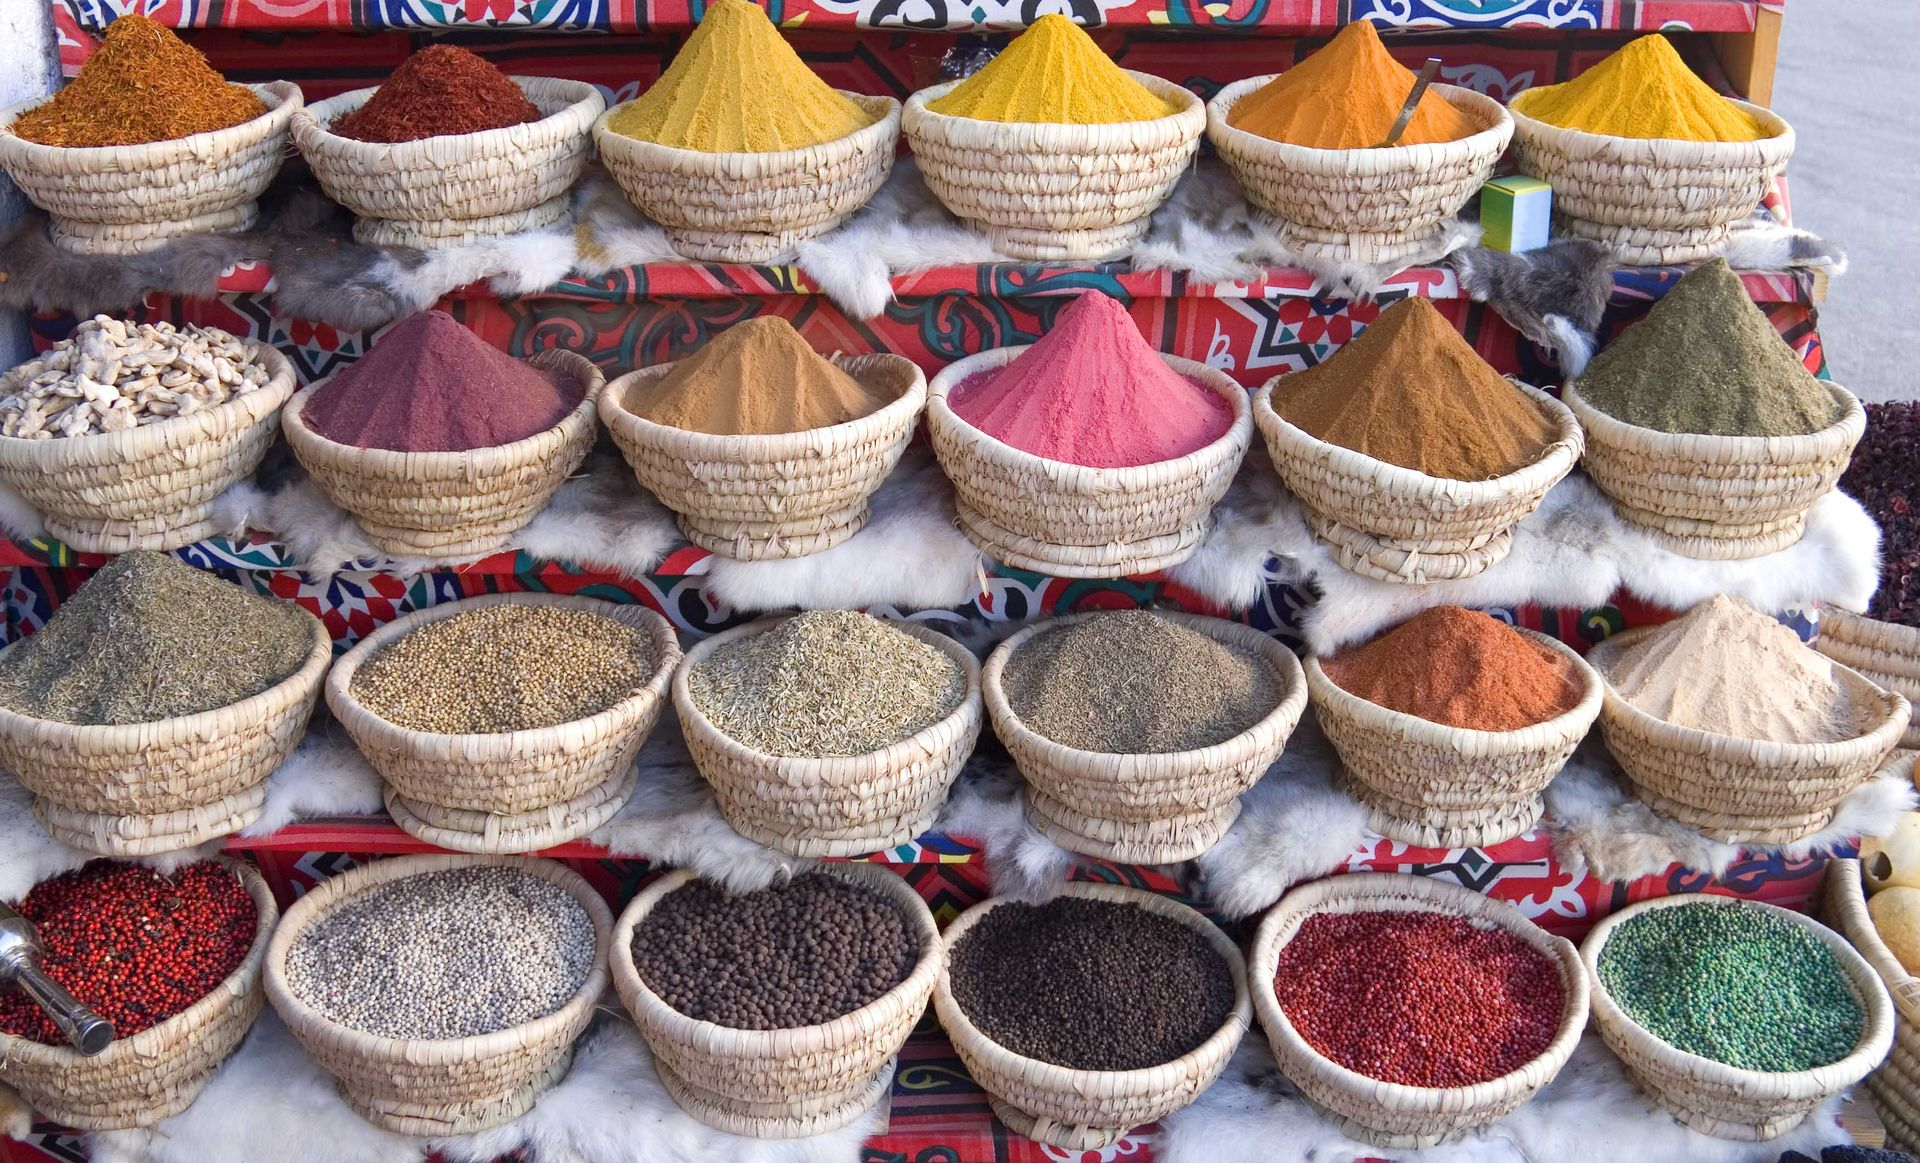 egypt egyptian spice sheikh sharm el market food drink shopping baskets spices bazaar foods holiday oriental khalili khan orient info